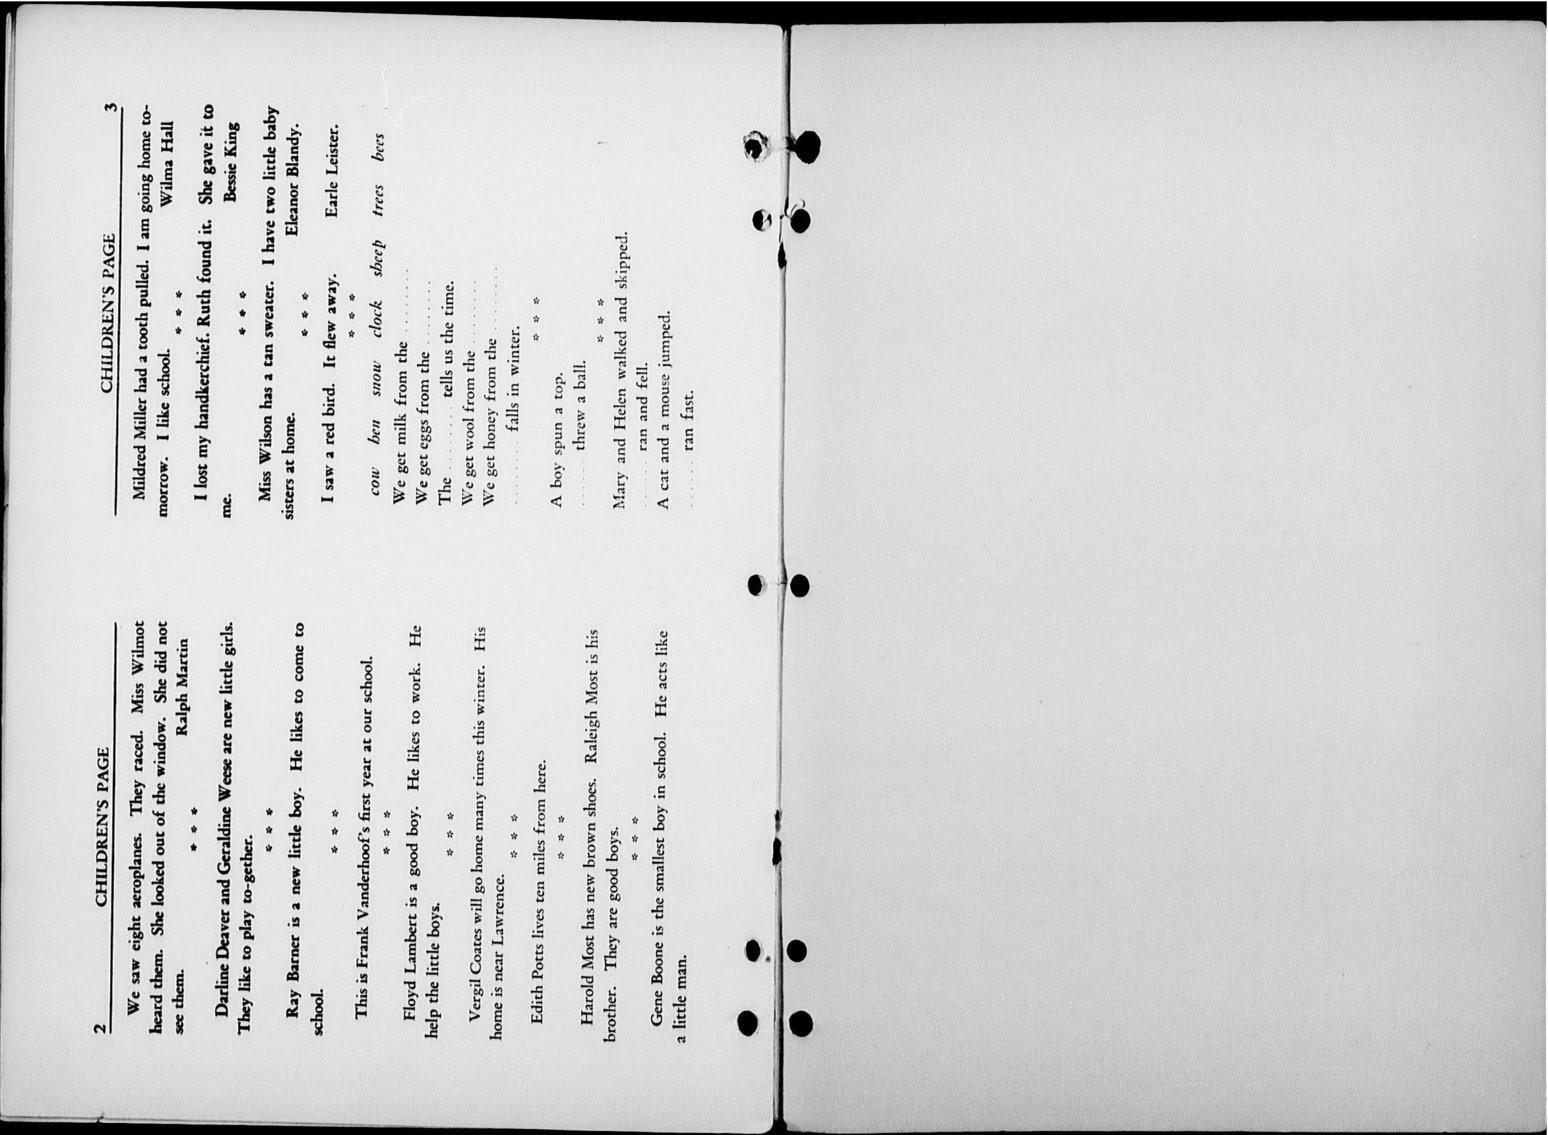 The Kansas Star, volume 52, number 1 - Children's page 2-3